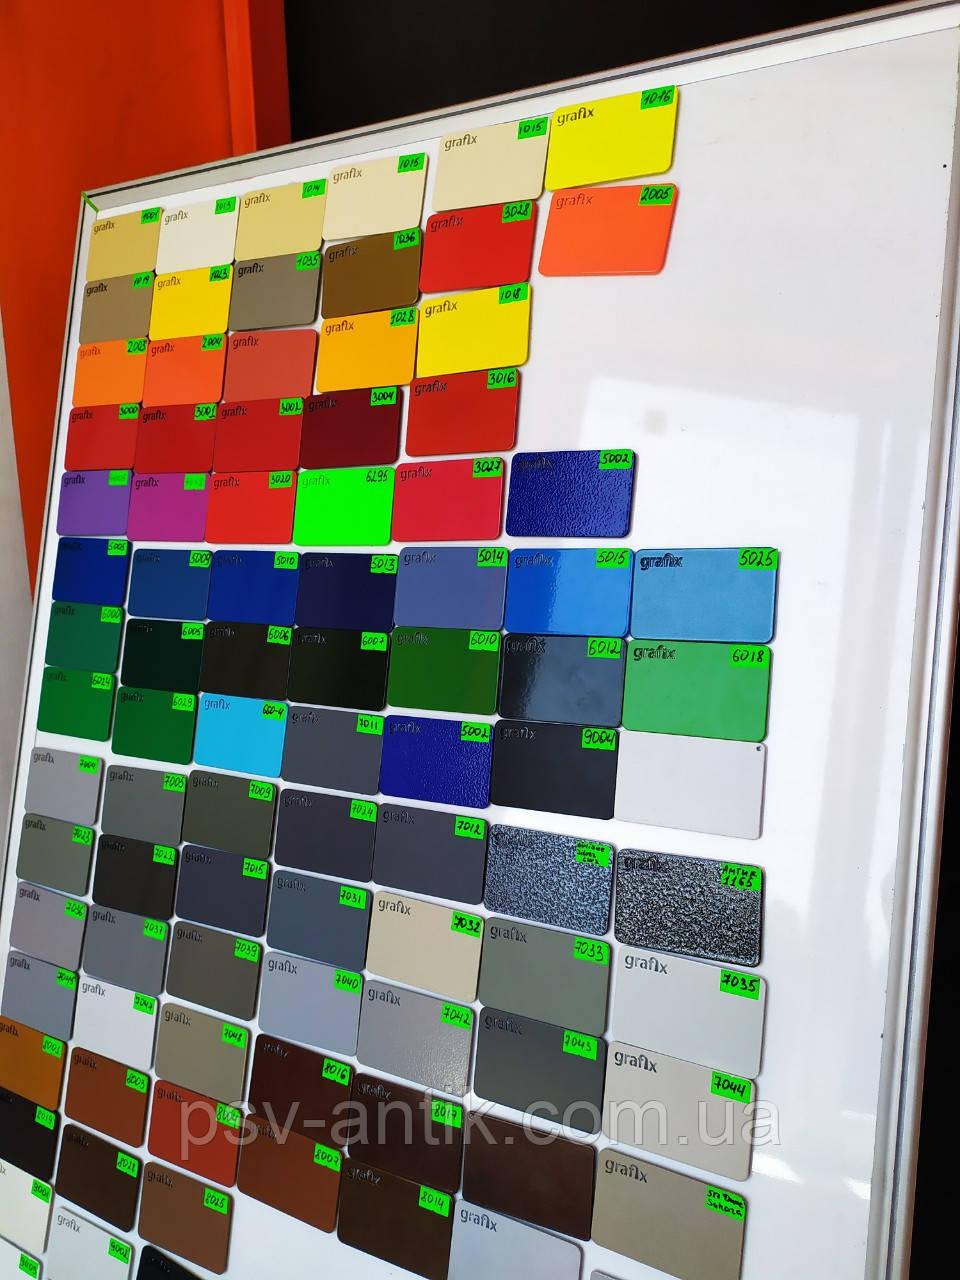 Порошковая краска глянцевая, полиэфирная, архитектурная, 6036